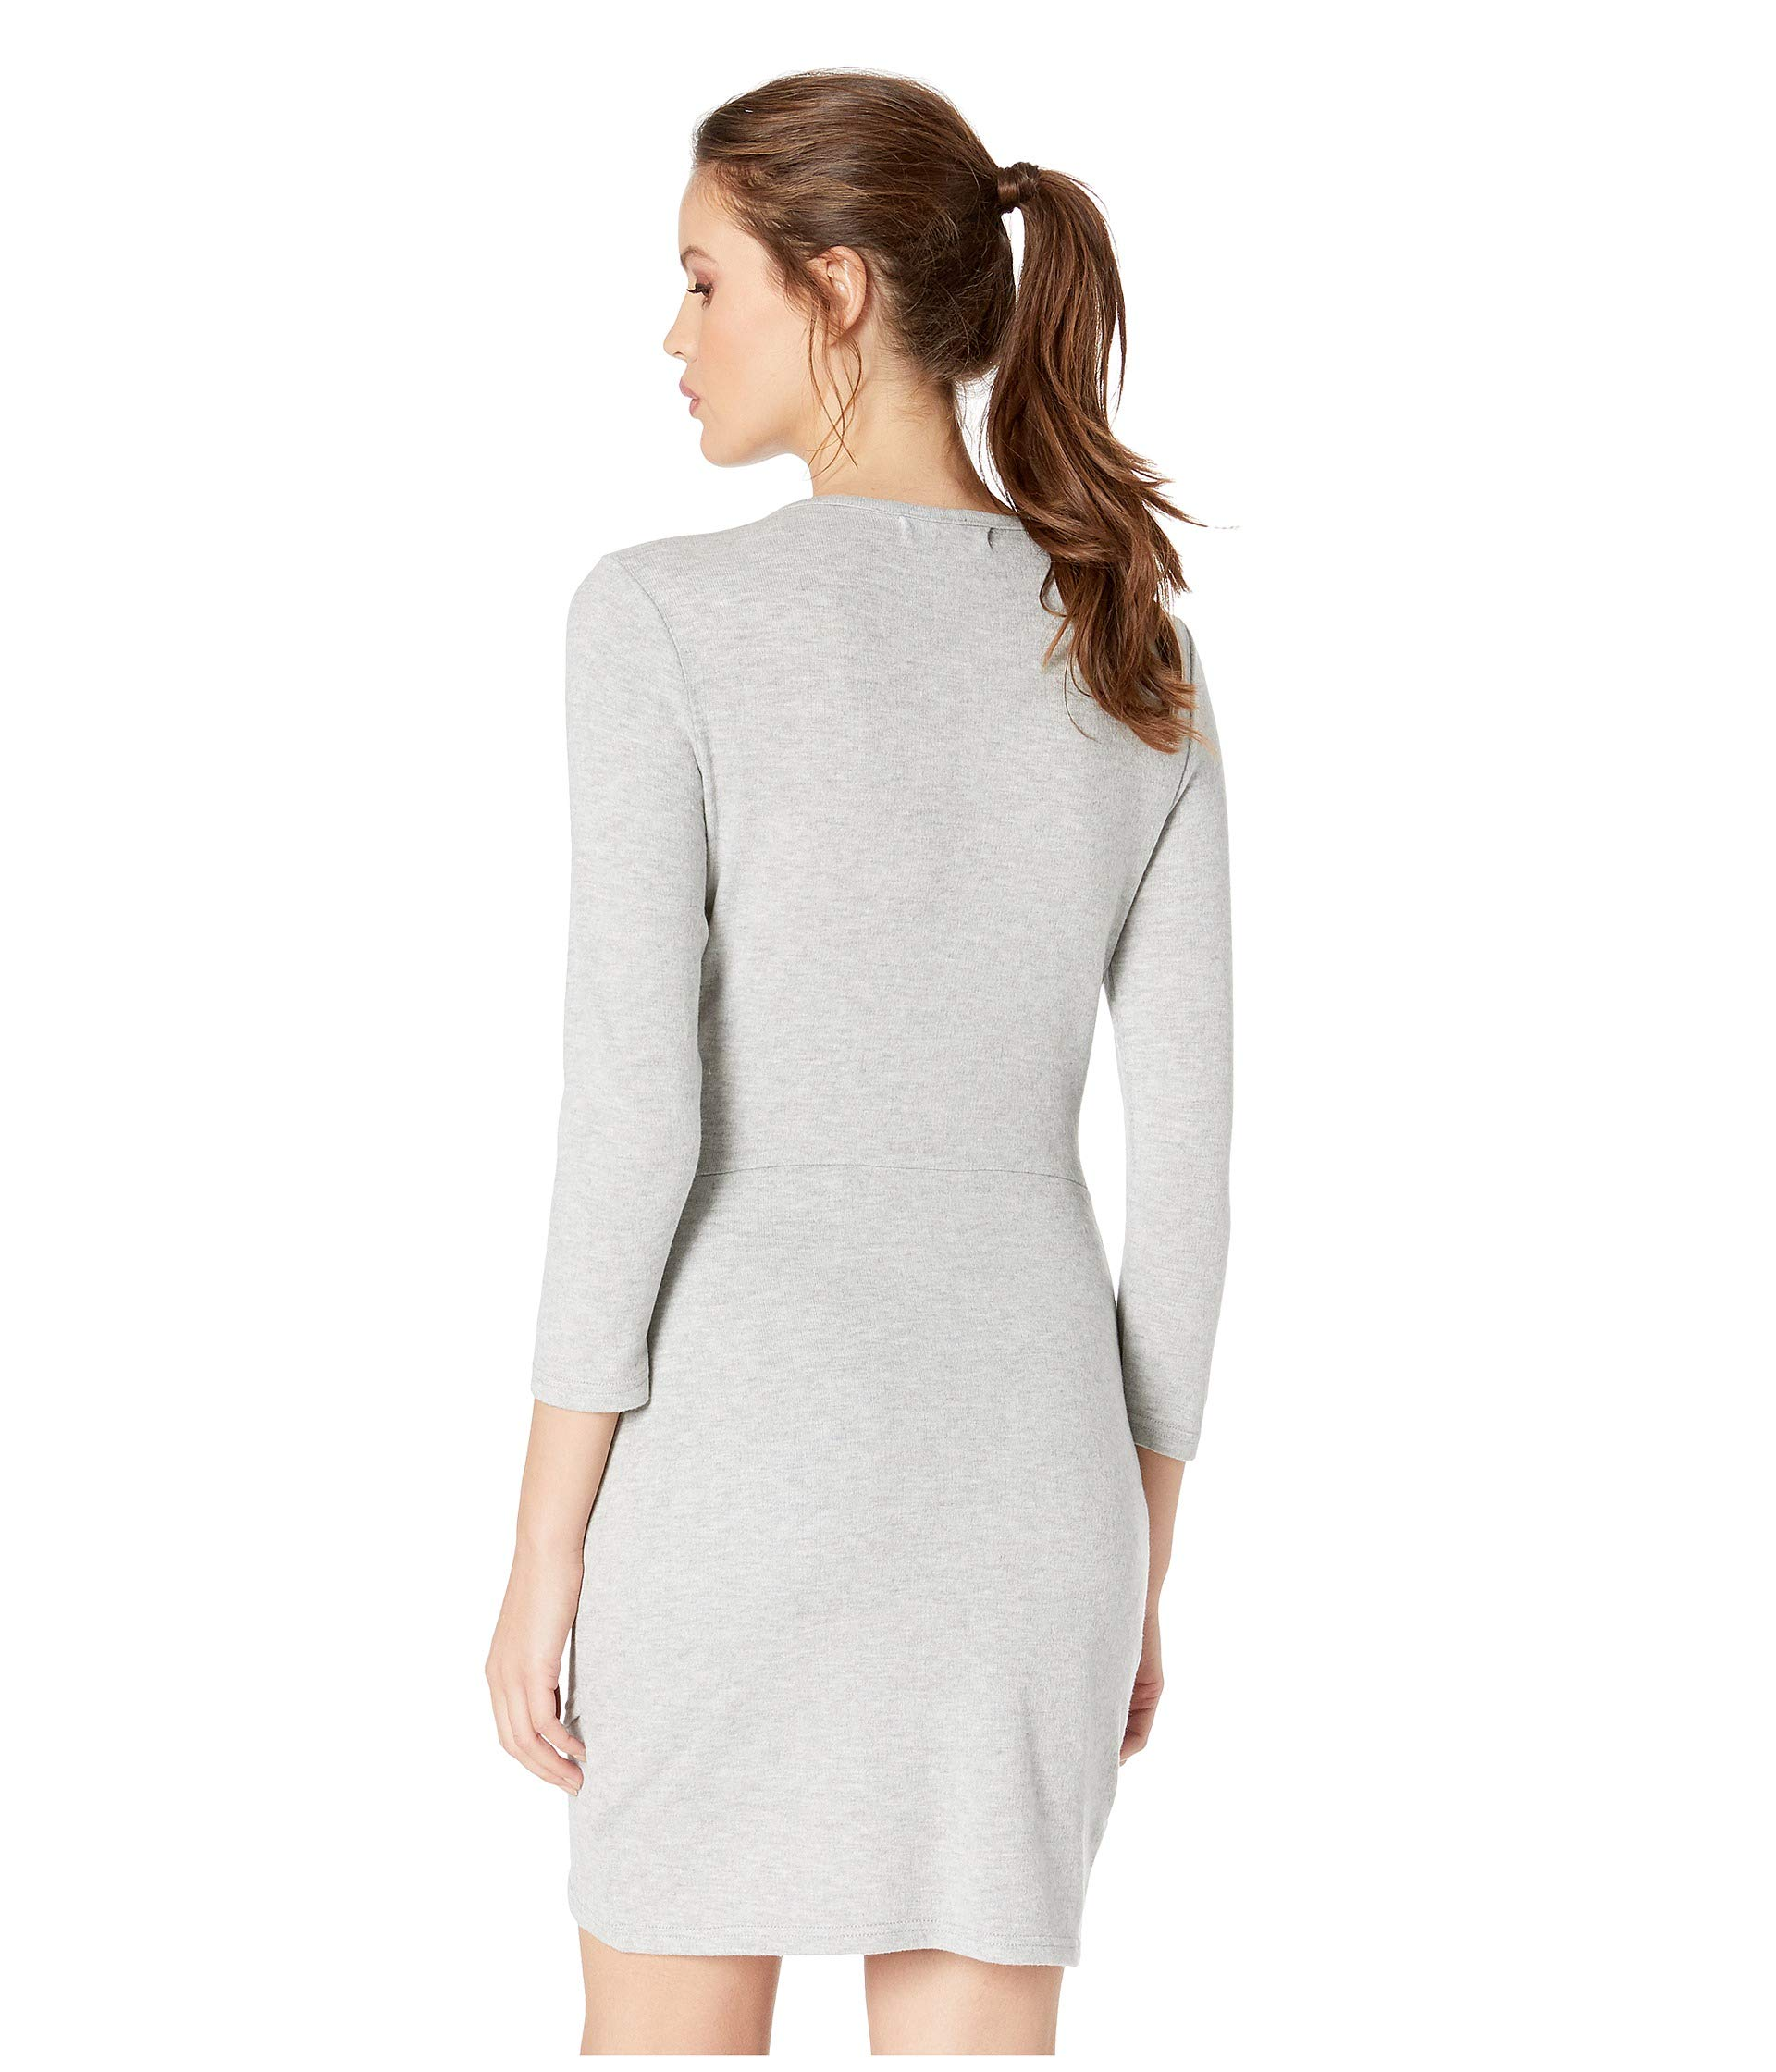 Bb Dress On Knit Jack By Up Brush Dakota Heather Light It Grey 5axqpxR6w